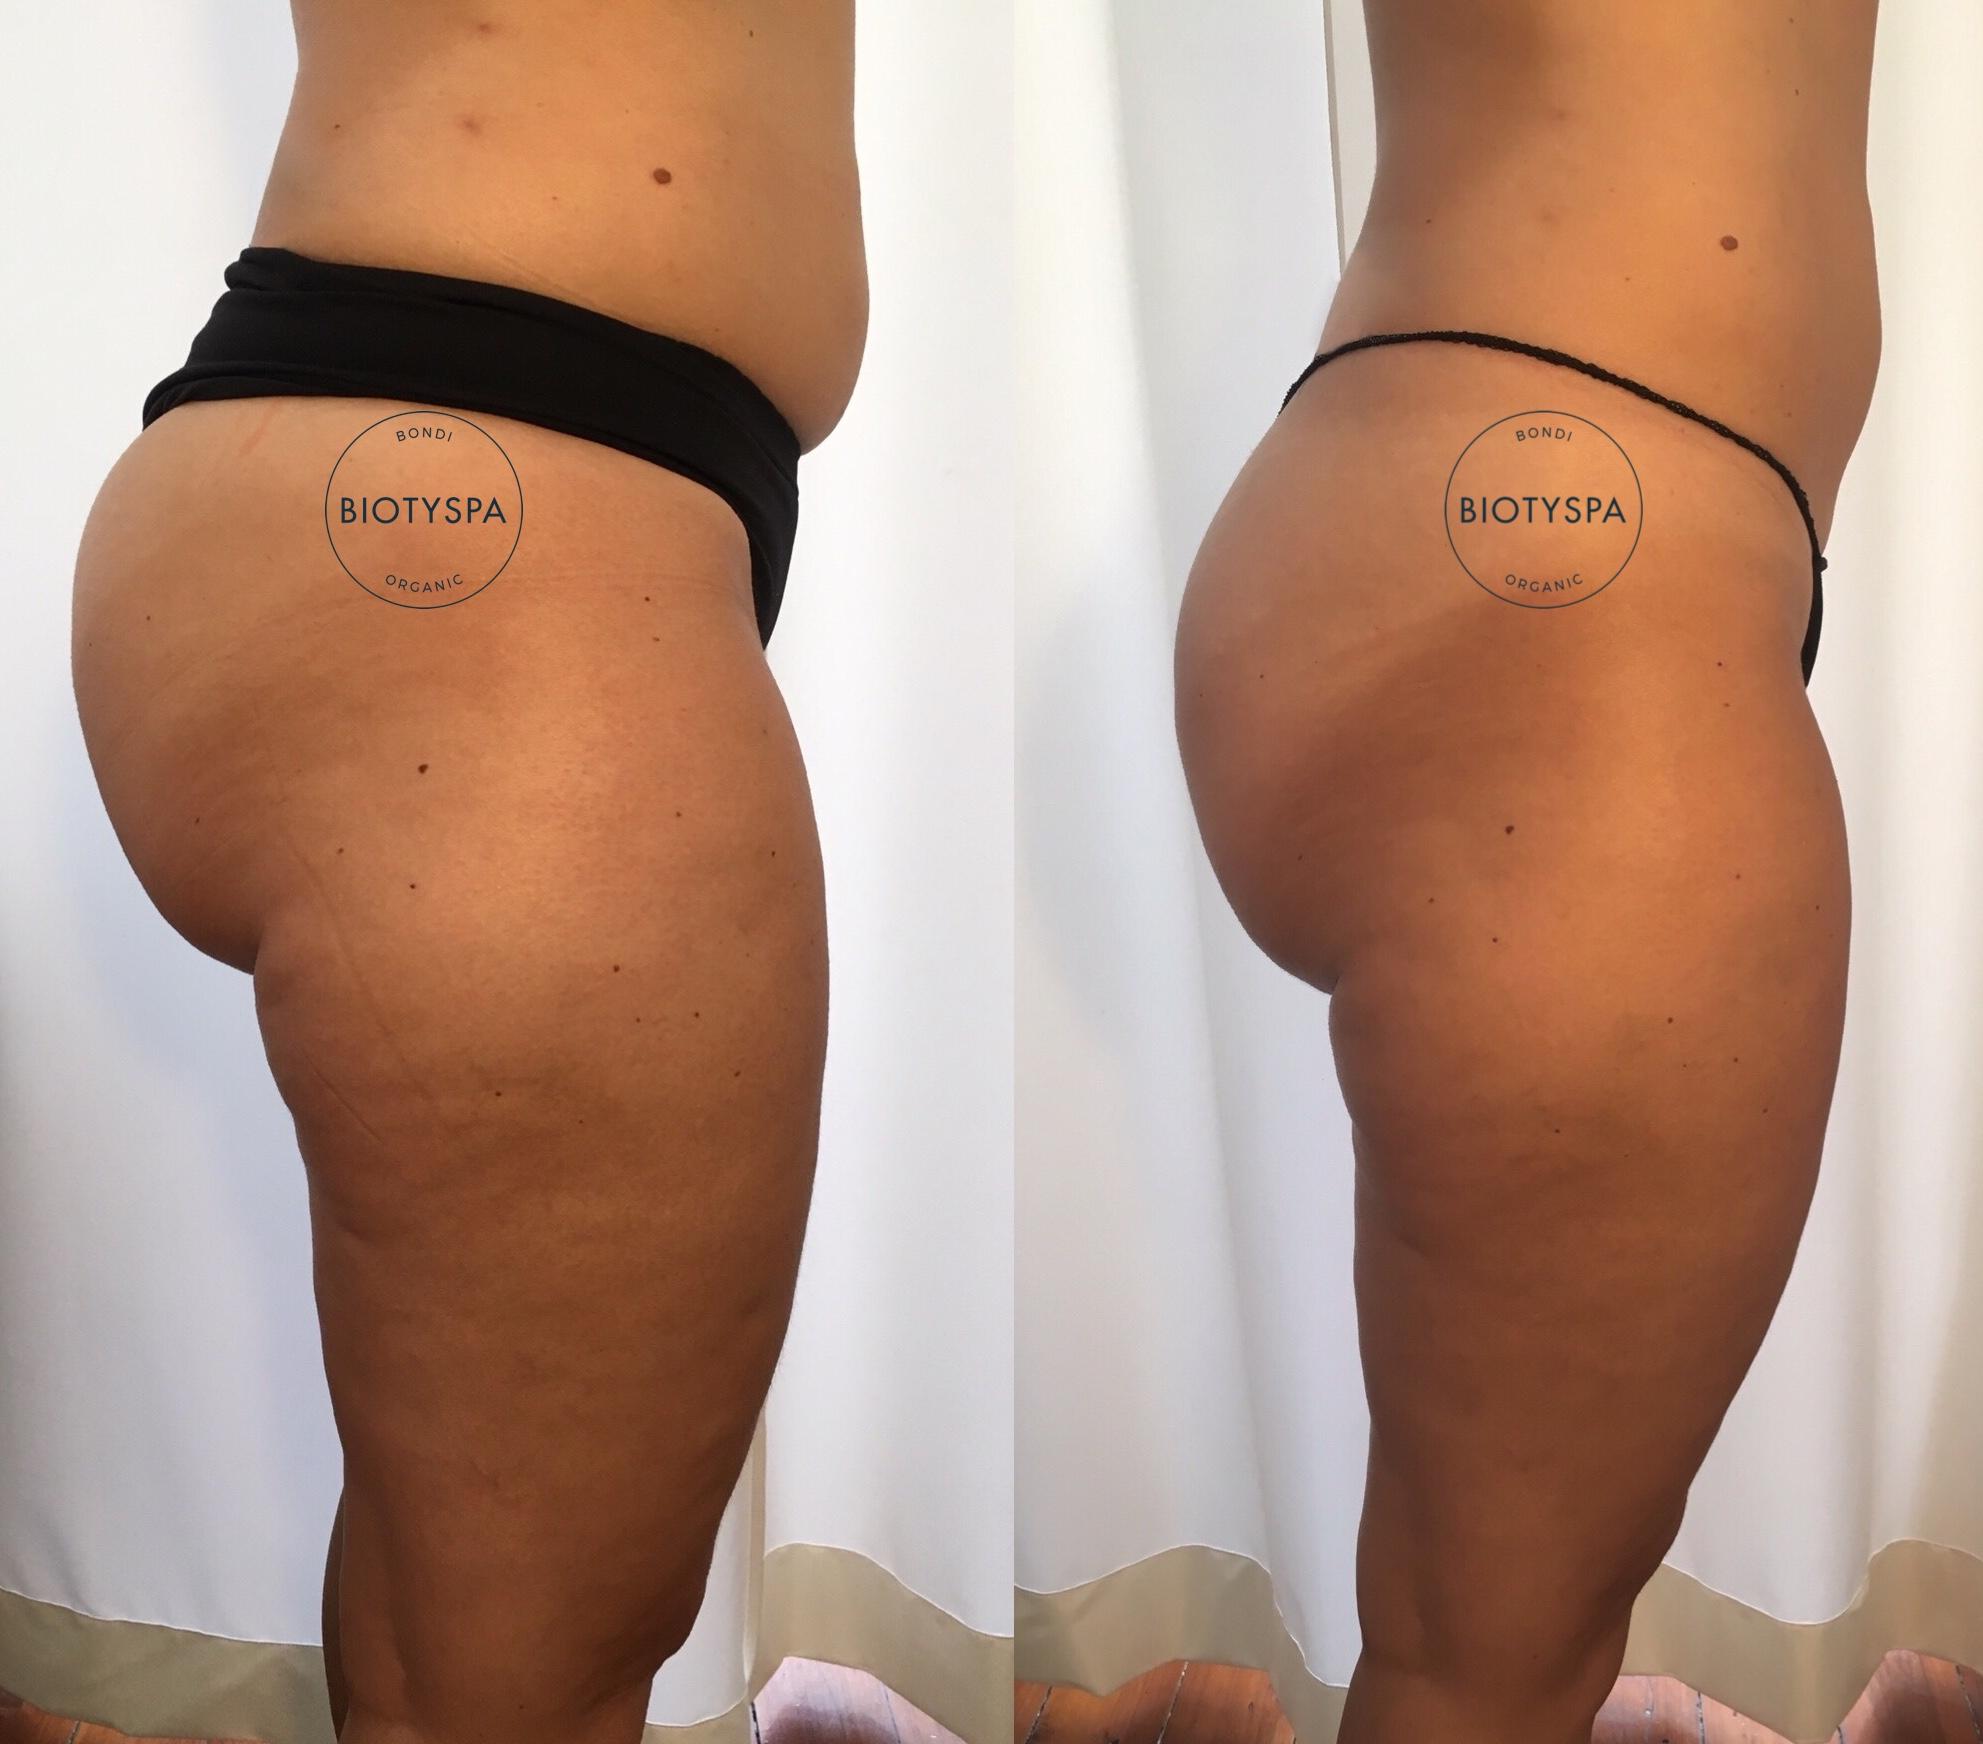 cellulite-treatment-biotyspa-activeslim-sides.jpg